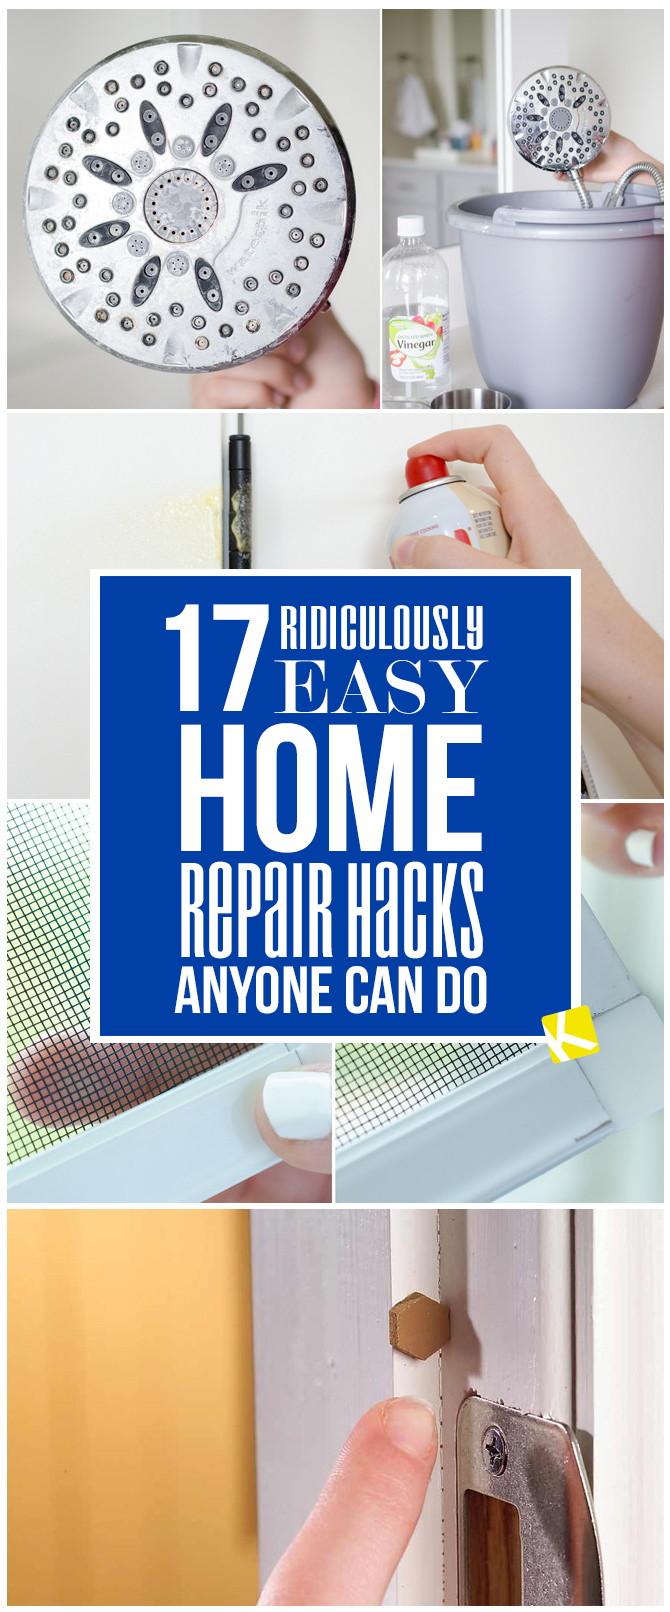 17 Ridiculously Easy Home Repair Hacks Anyone Can Do